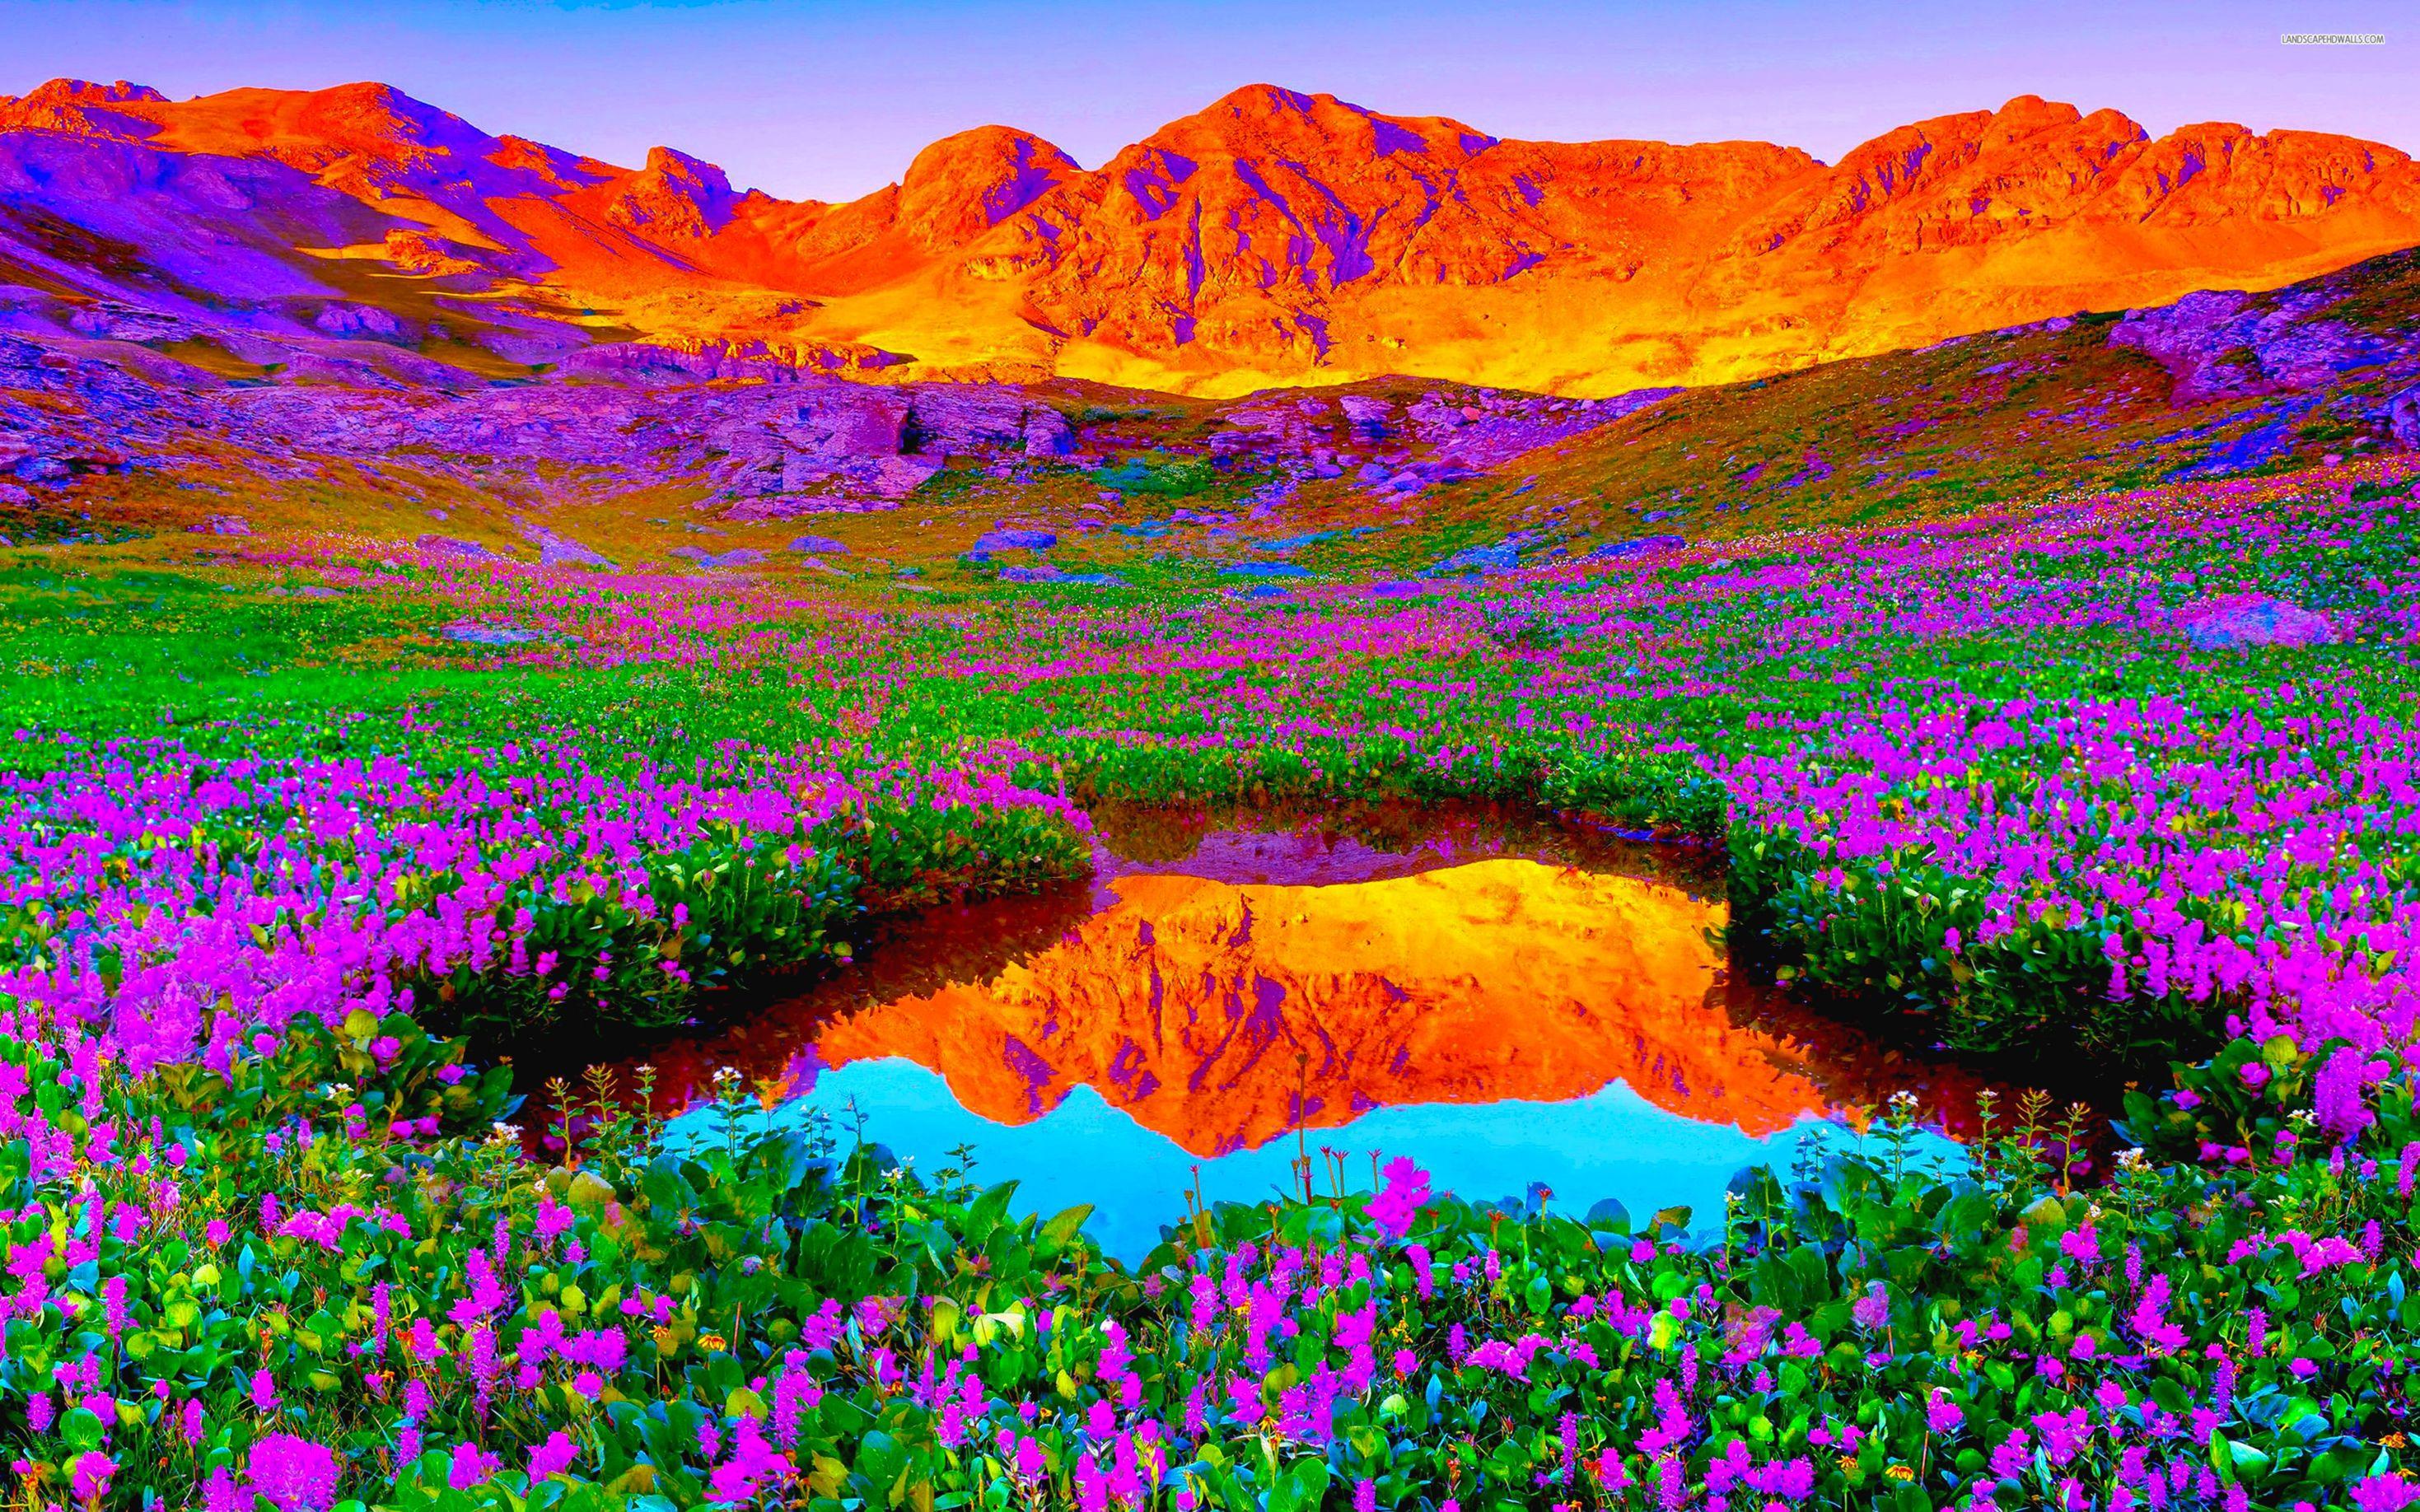 vibrant desktop backgrounds - google